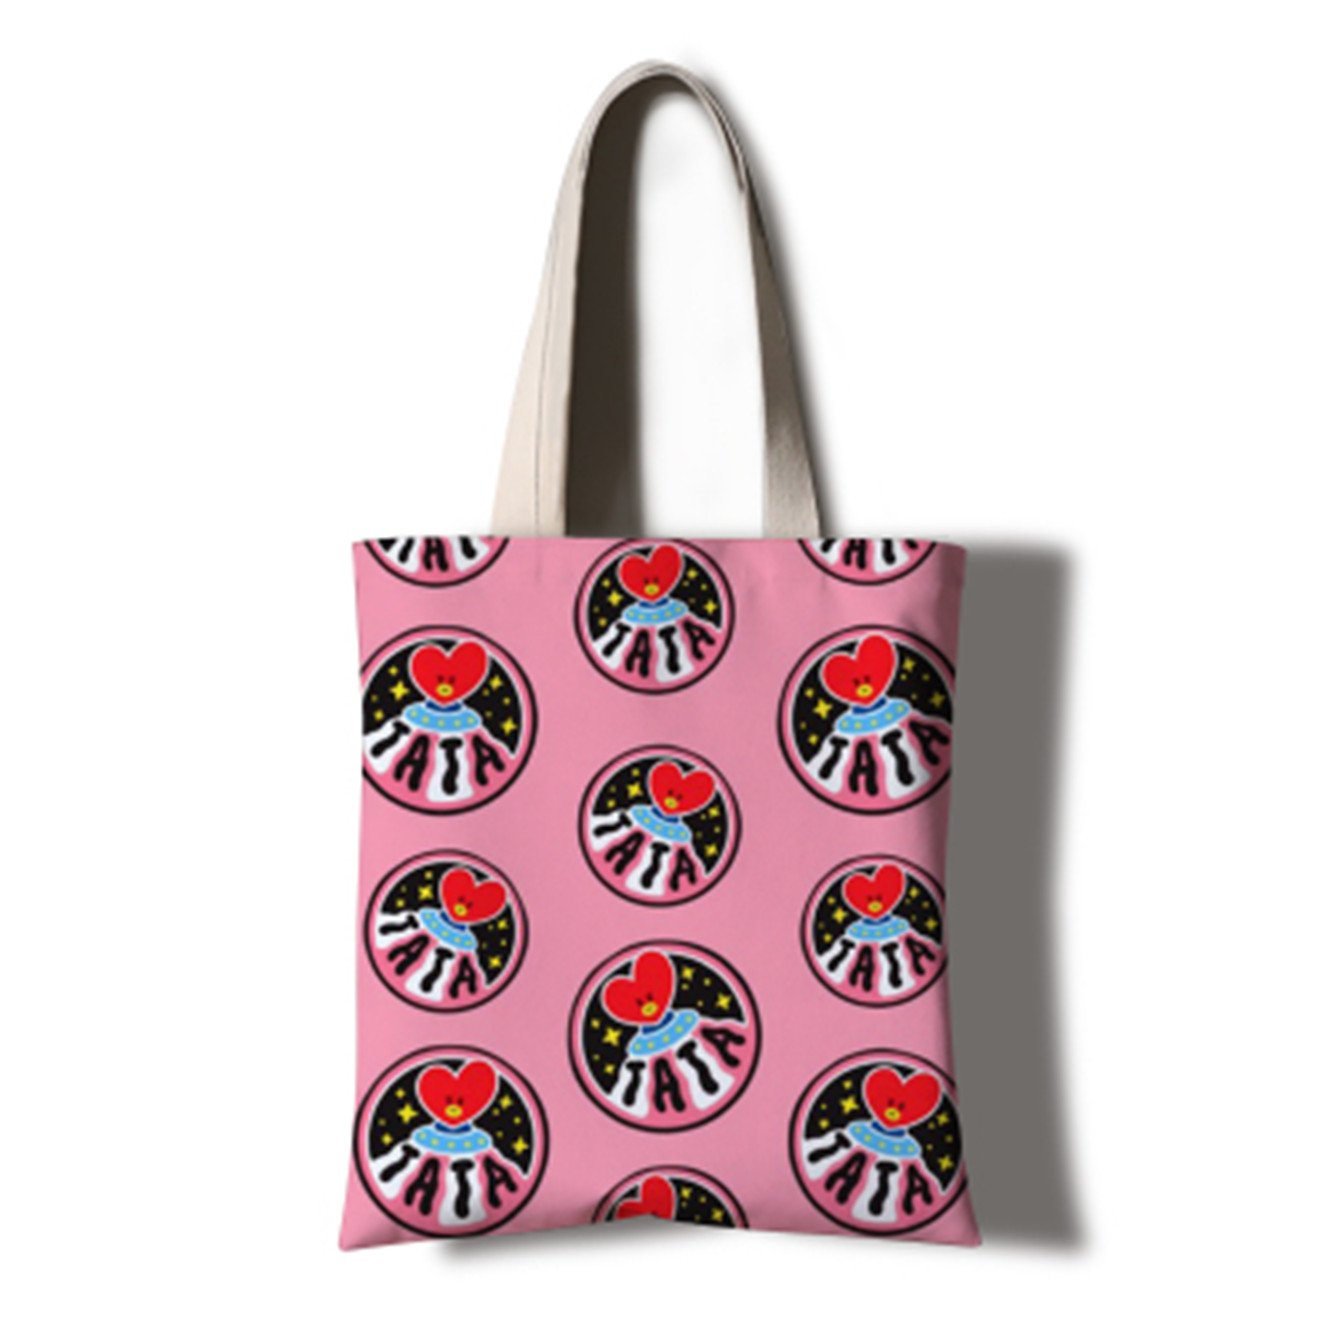 JUSTGOGO KPOP BTS Bangtan boys Casual Messenger Bag Cross-body Bag Shoulder Bag Travel Bag Handbag Tote Bag (32)